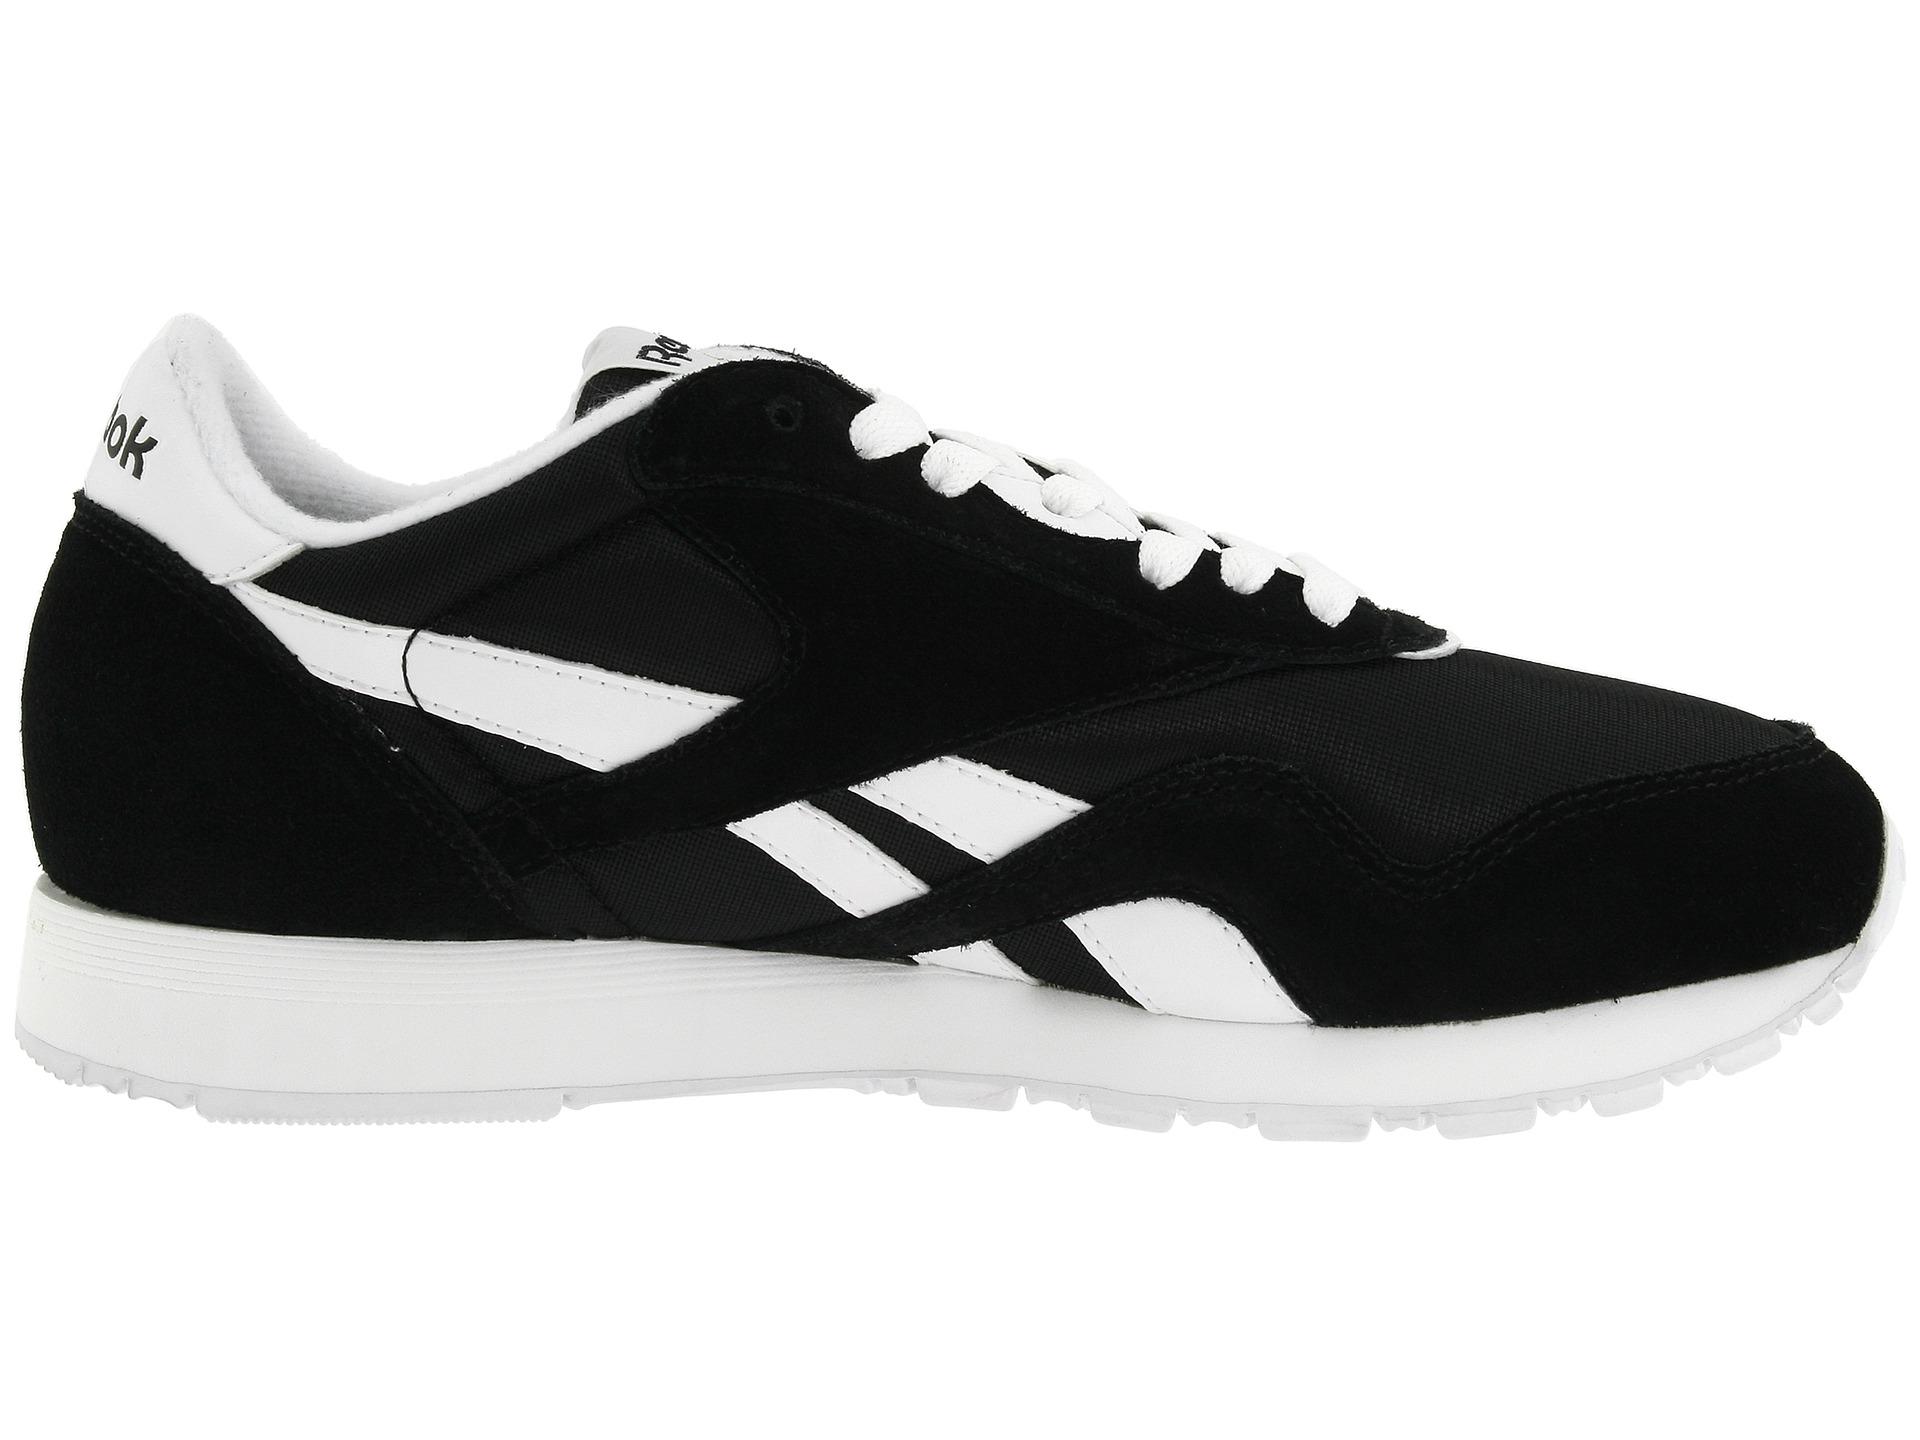 reebok lifestyle classic nylon w femme blanc noir sneakers